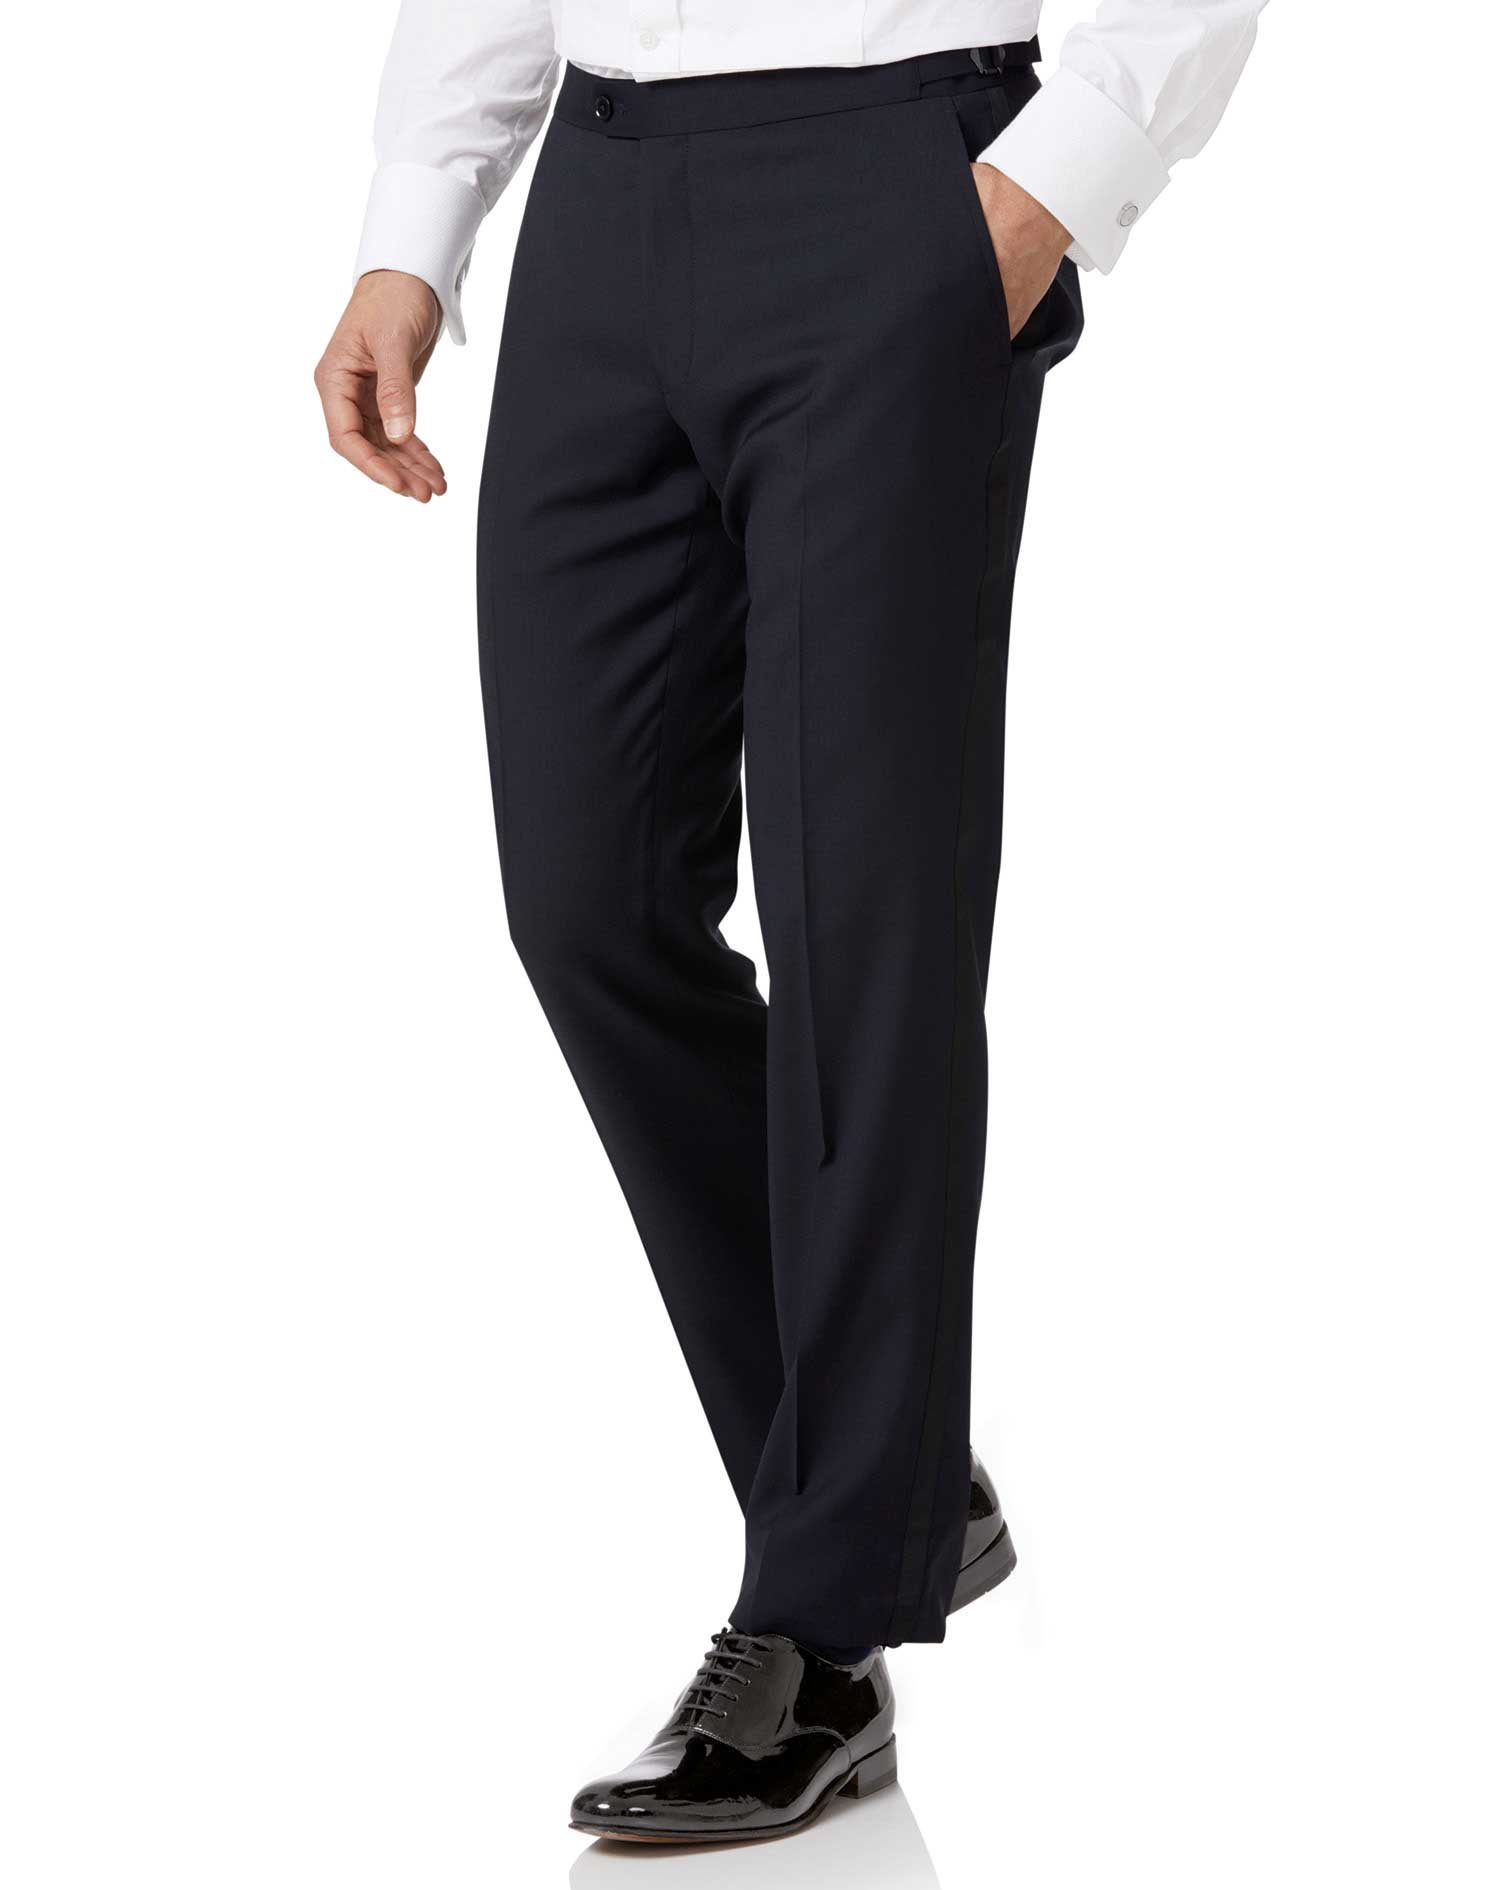 Midnight Blue Slim Fit Tuxedo Trousers Size W36 L38 by Charles Tyrwhitt